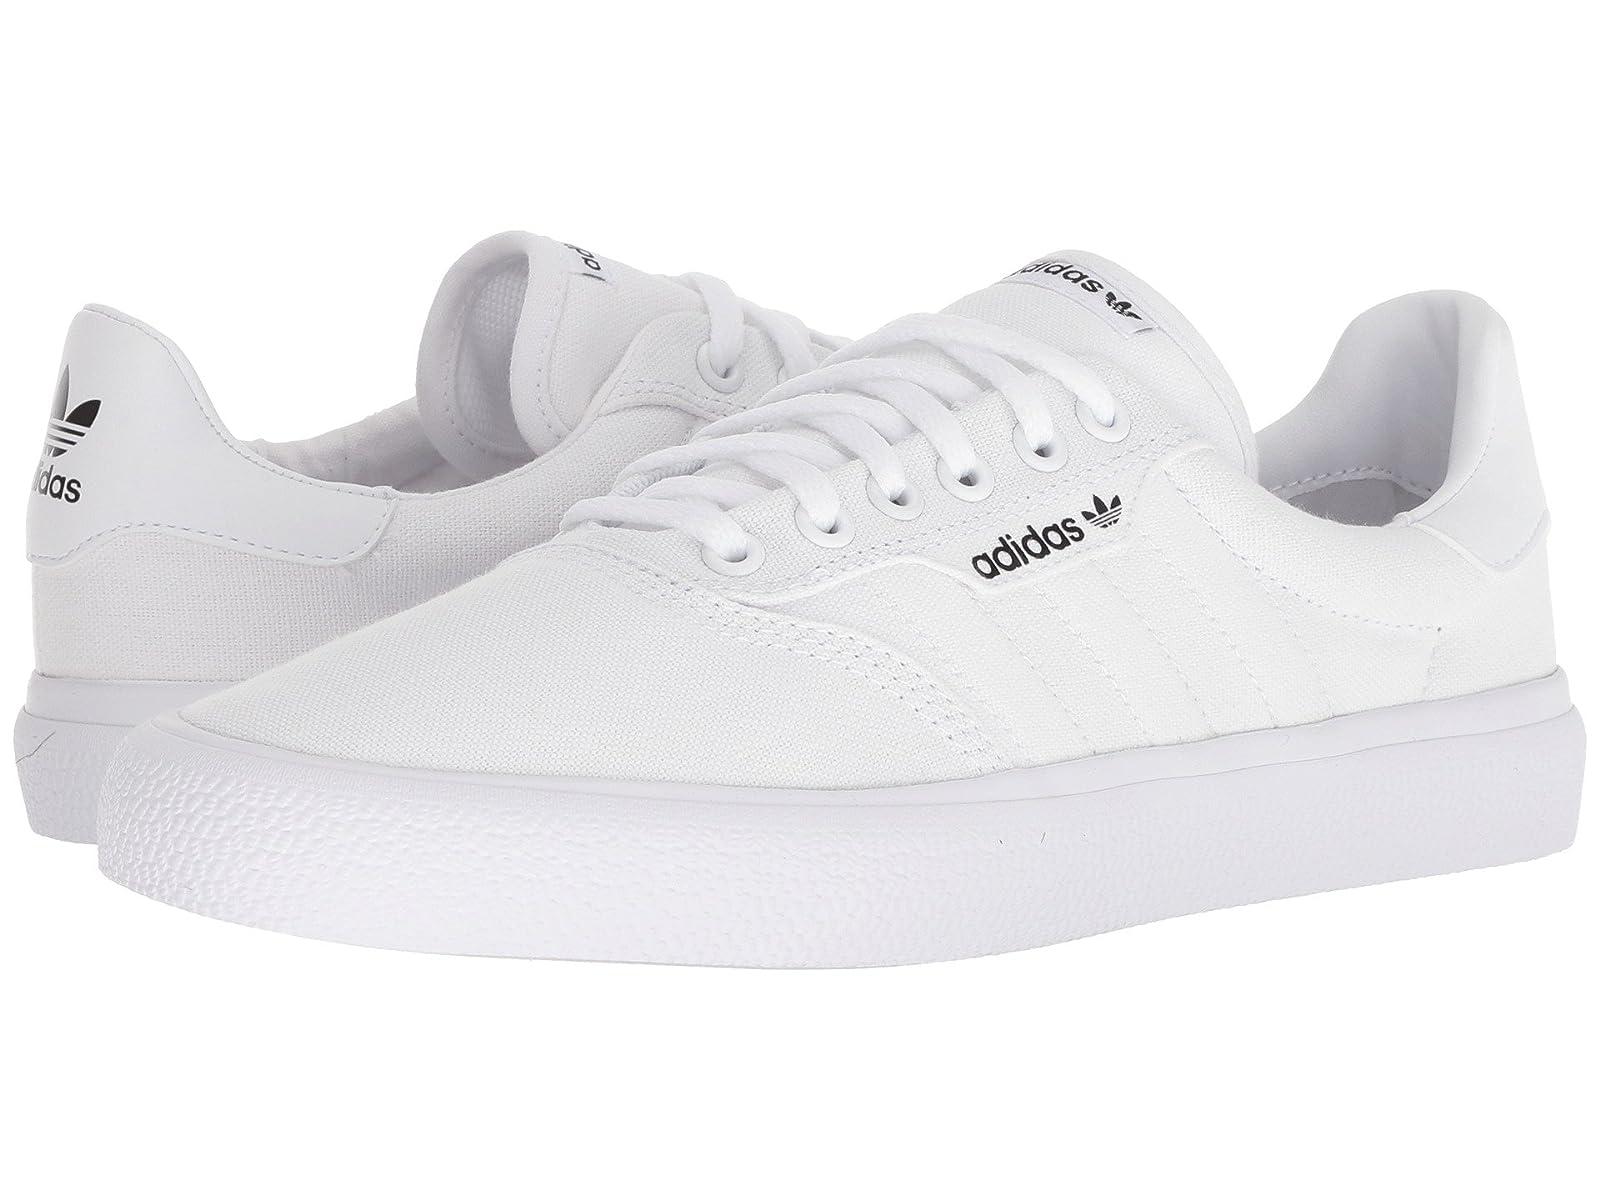 adidas Skateboarding 3MCAtmospheric grades have affordable shoes